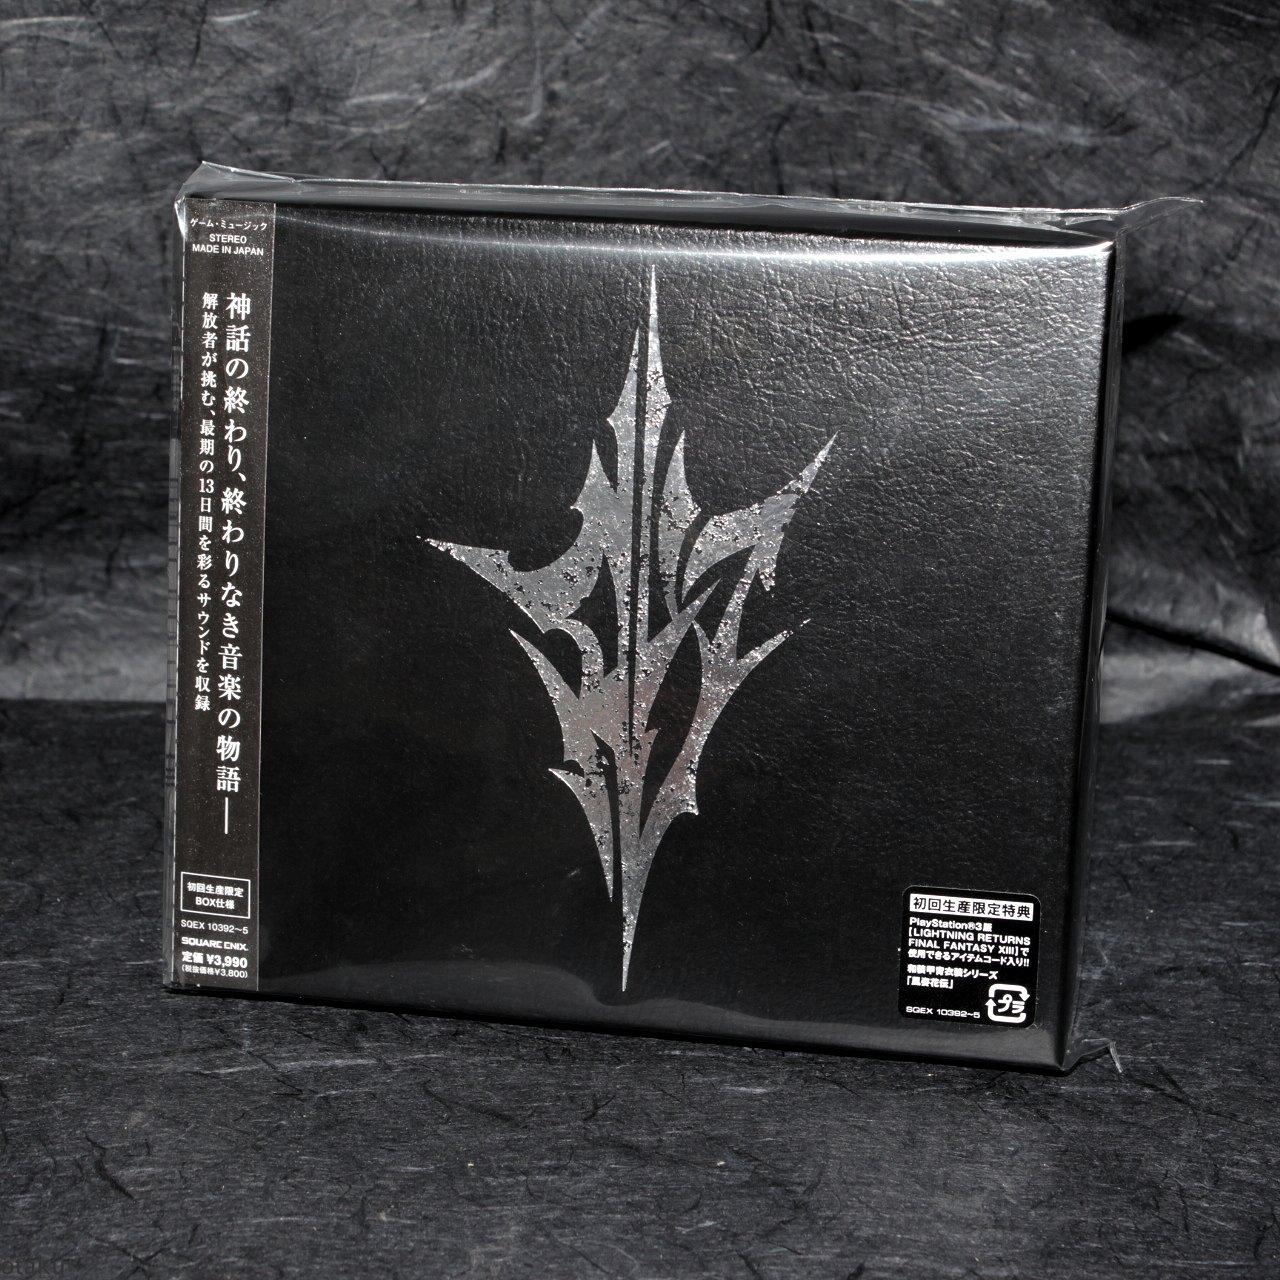 LIGHTNING RETURNS FINAL FANTASY XIII Original Soundtrack 4 CD Box Set NEW